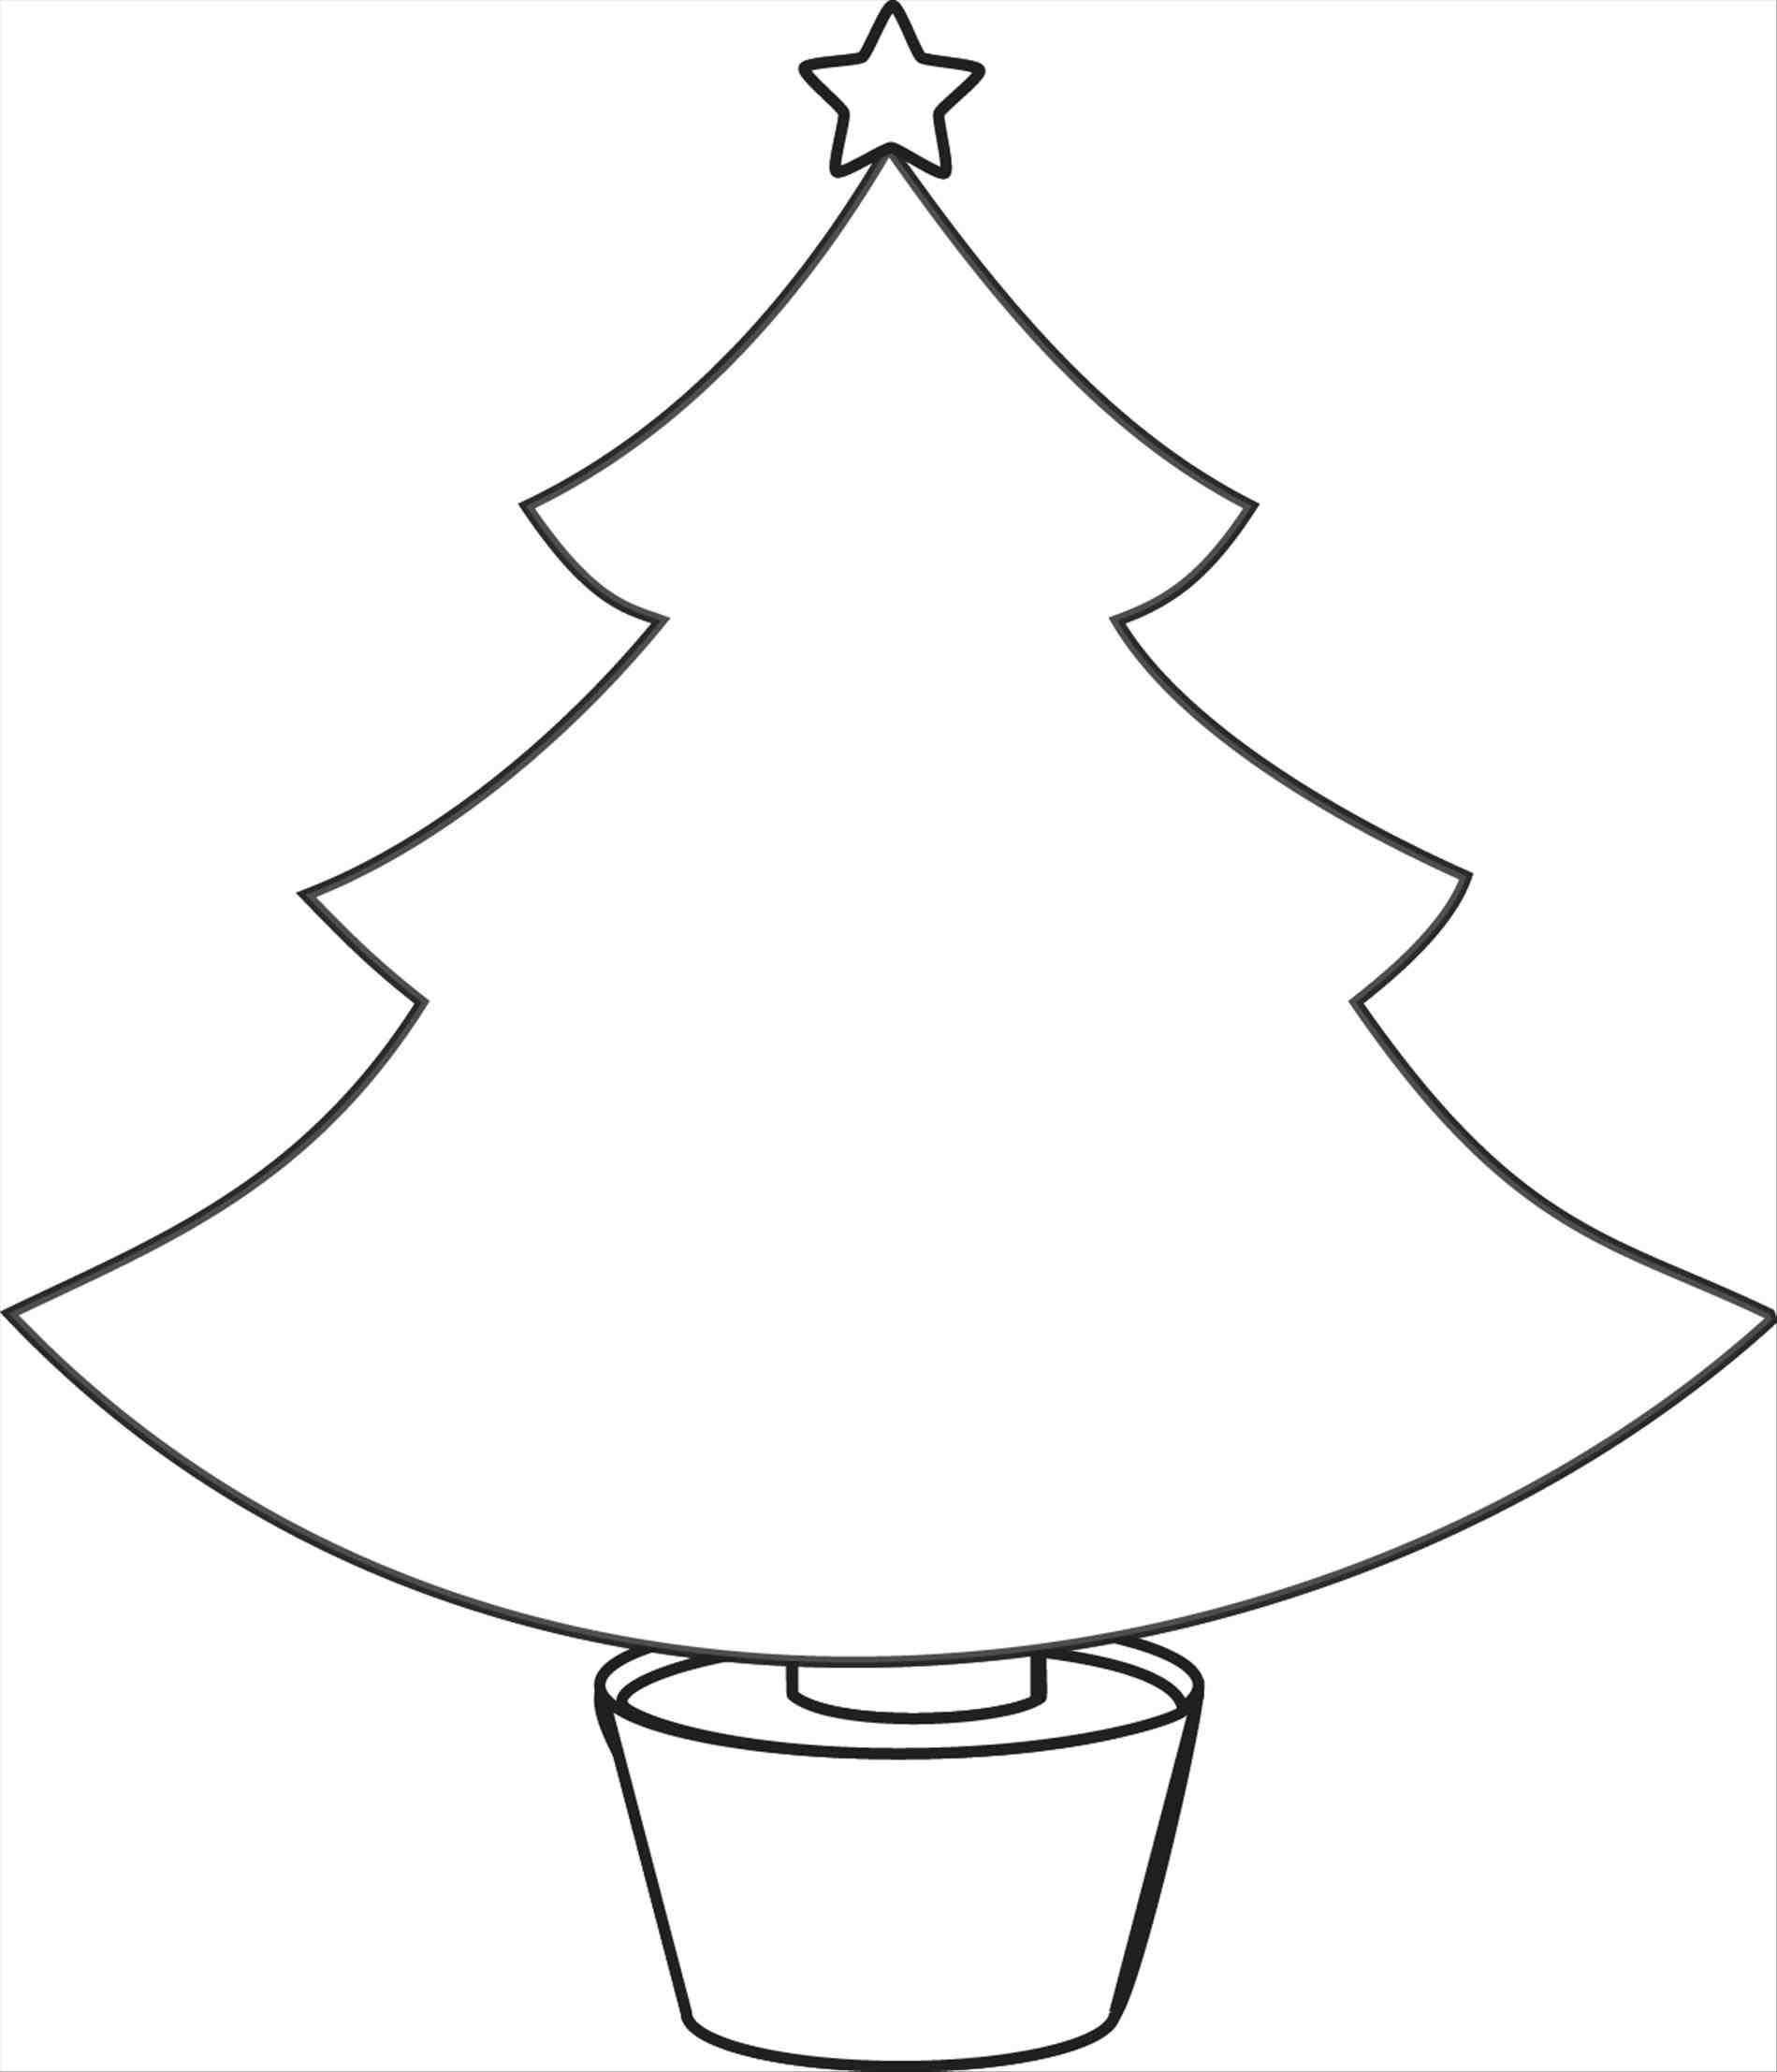 Pin by Cloe Puppy on vectors etc | Christmas tree ...